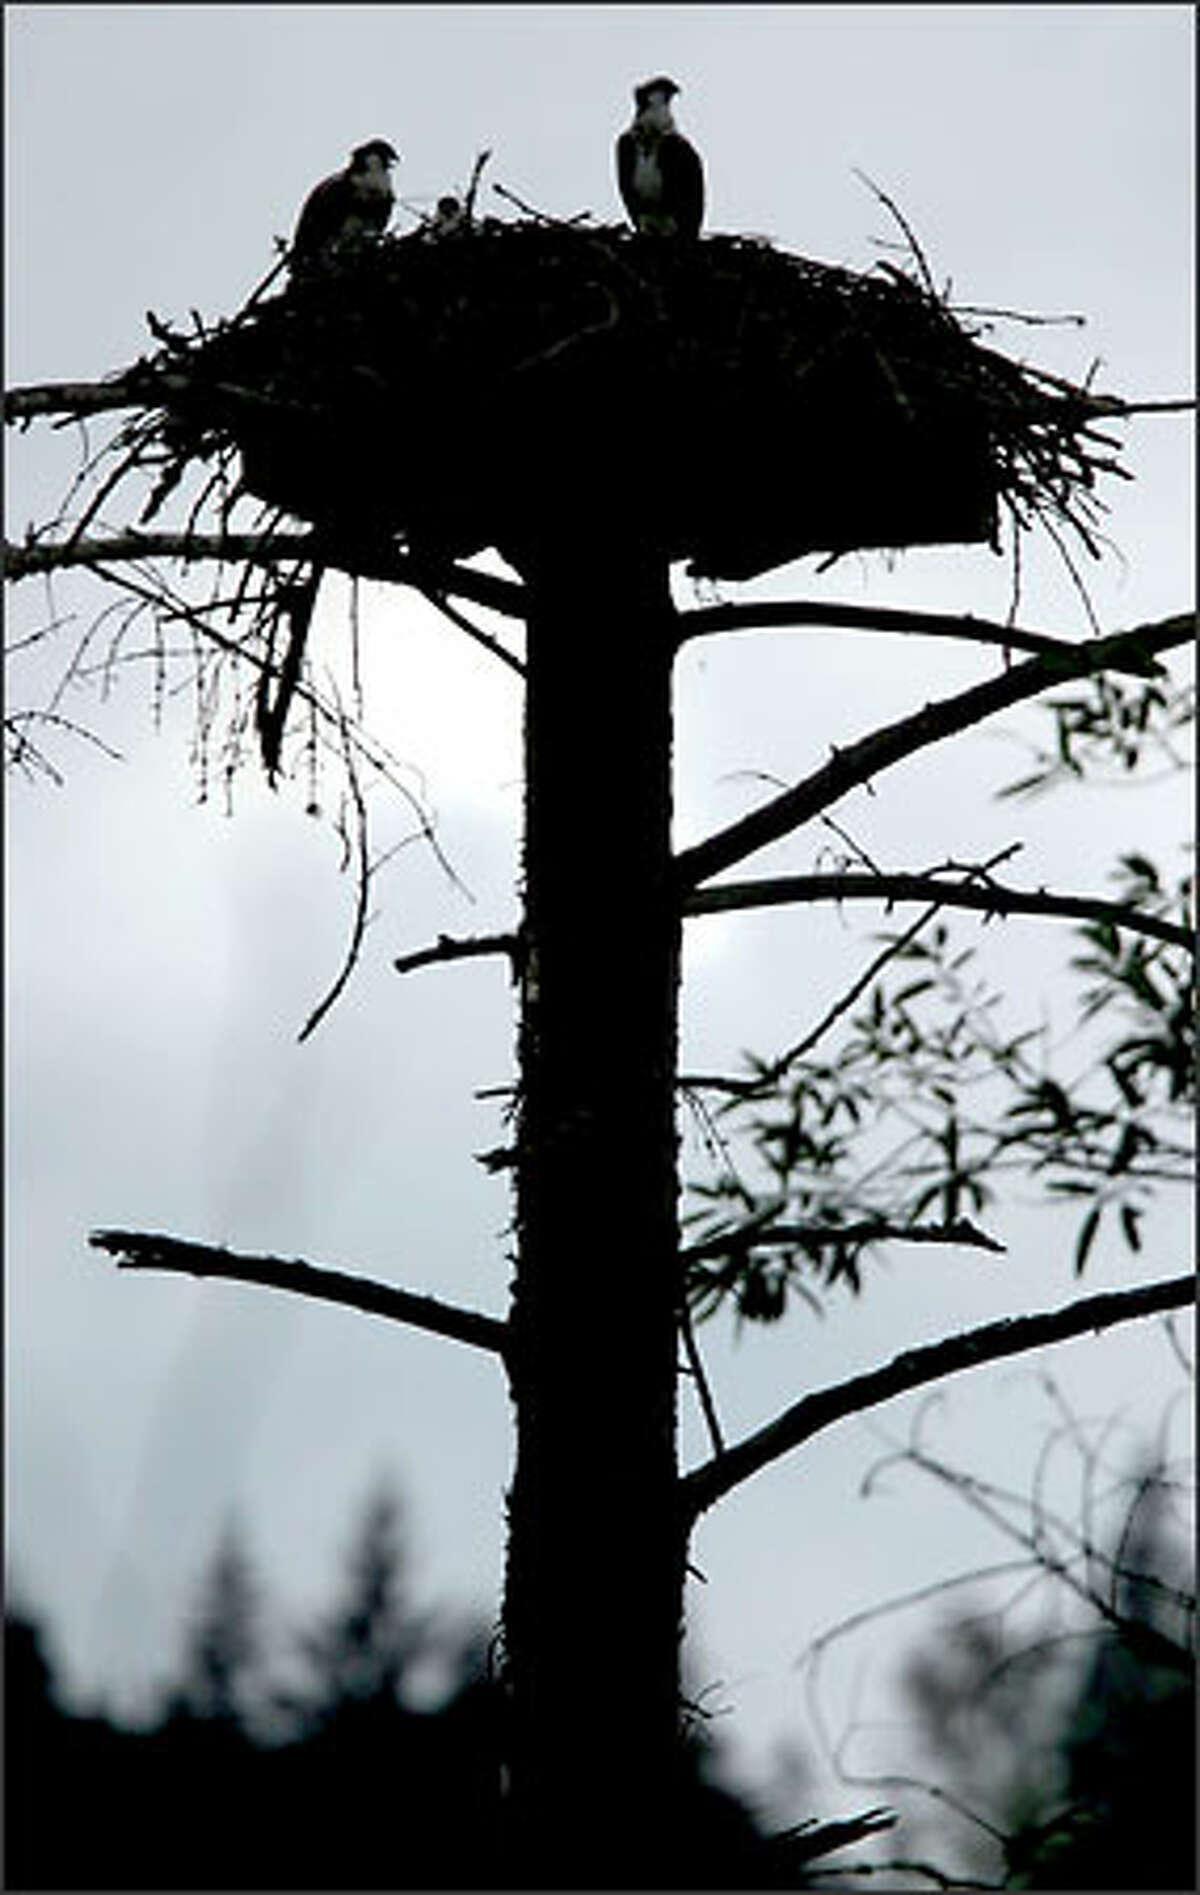 Osprey perch atop their nest at Carnation Marsh.